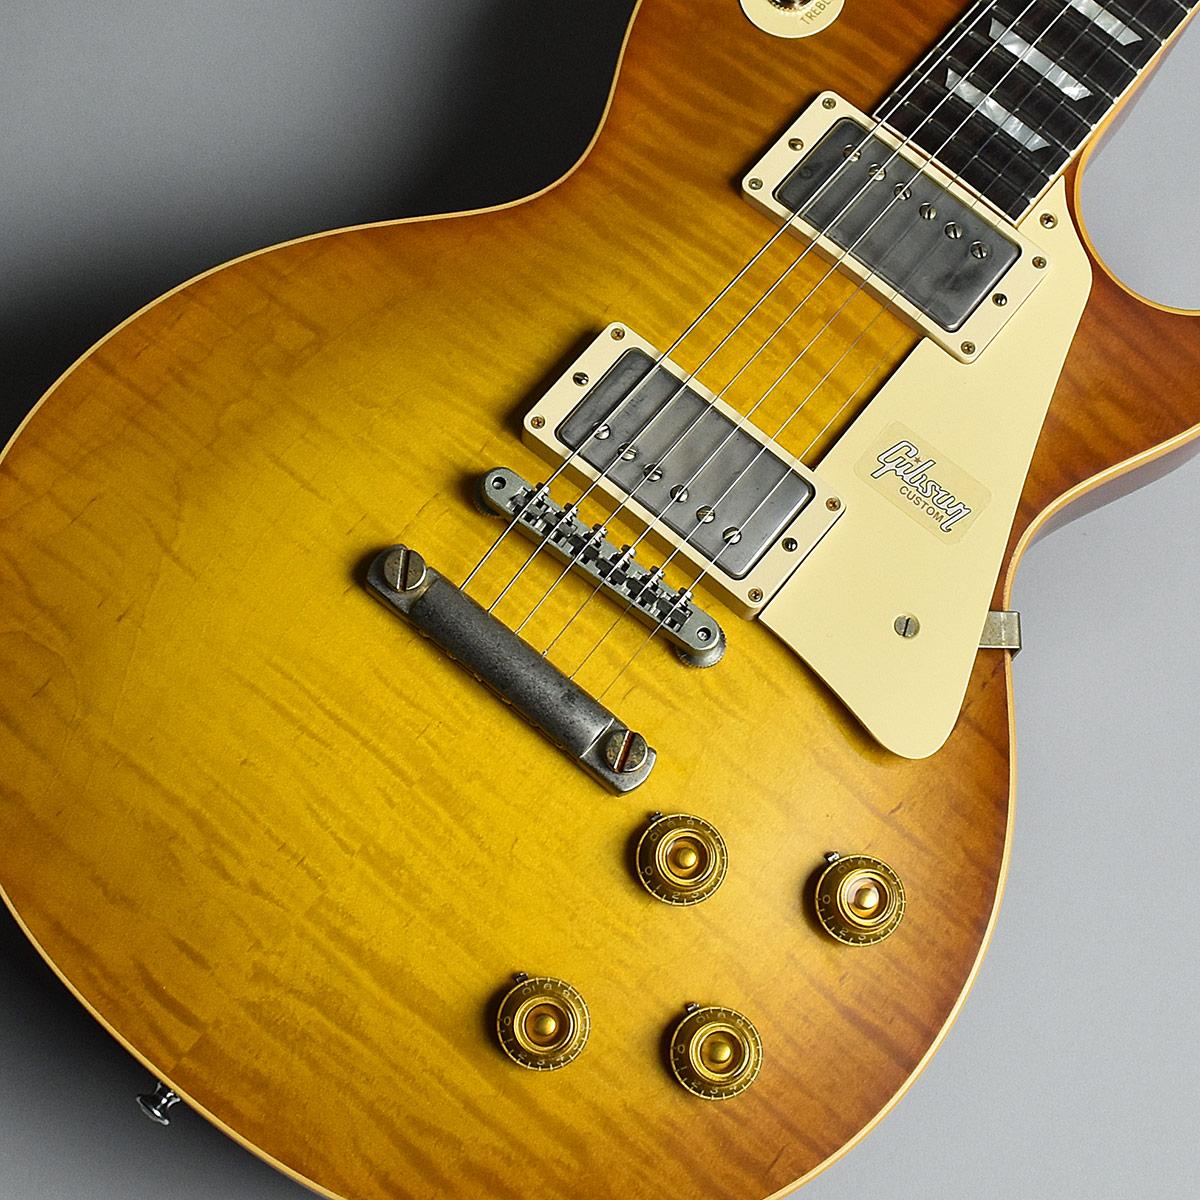 Gibson Custom Shop 1959 Les Paul Standard VOS M2M Iced Tea S/N:971638 現地選定材オーダー品 【ギブソン カスタムショップ】【未展示品】